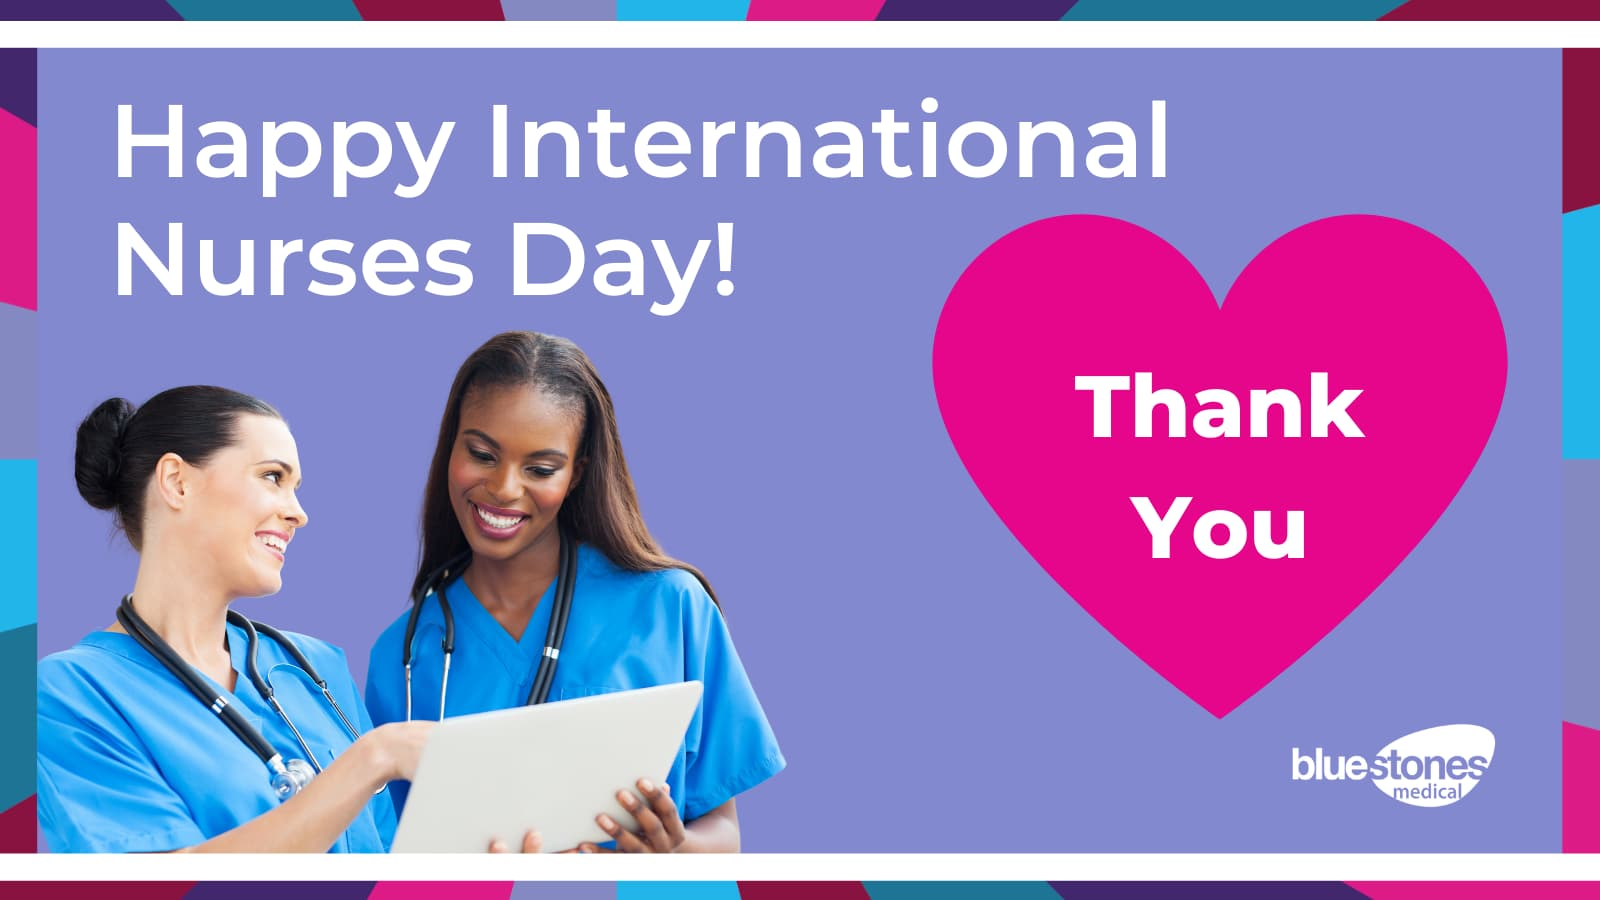 Celebrating International Nurses Day